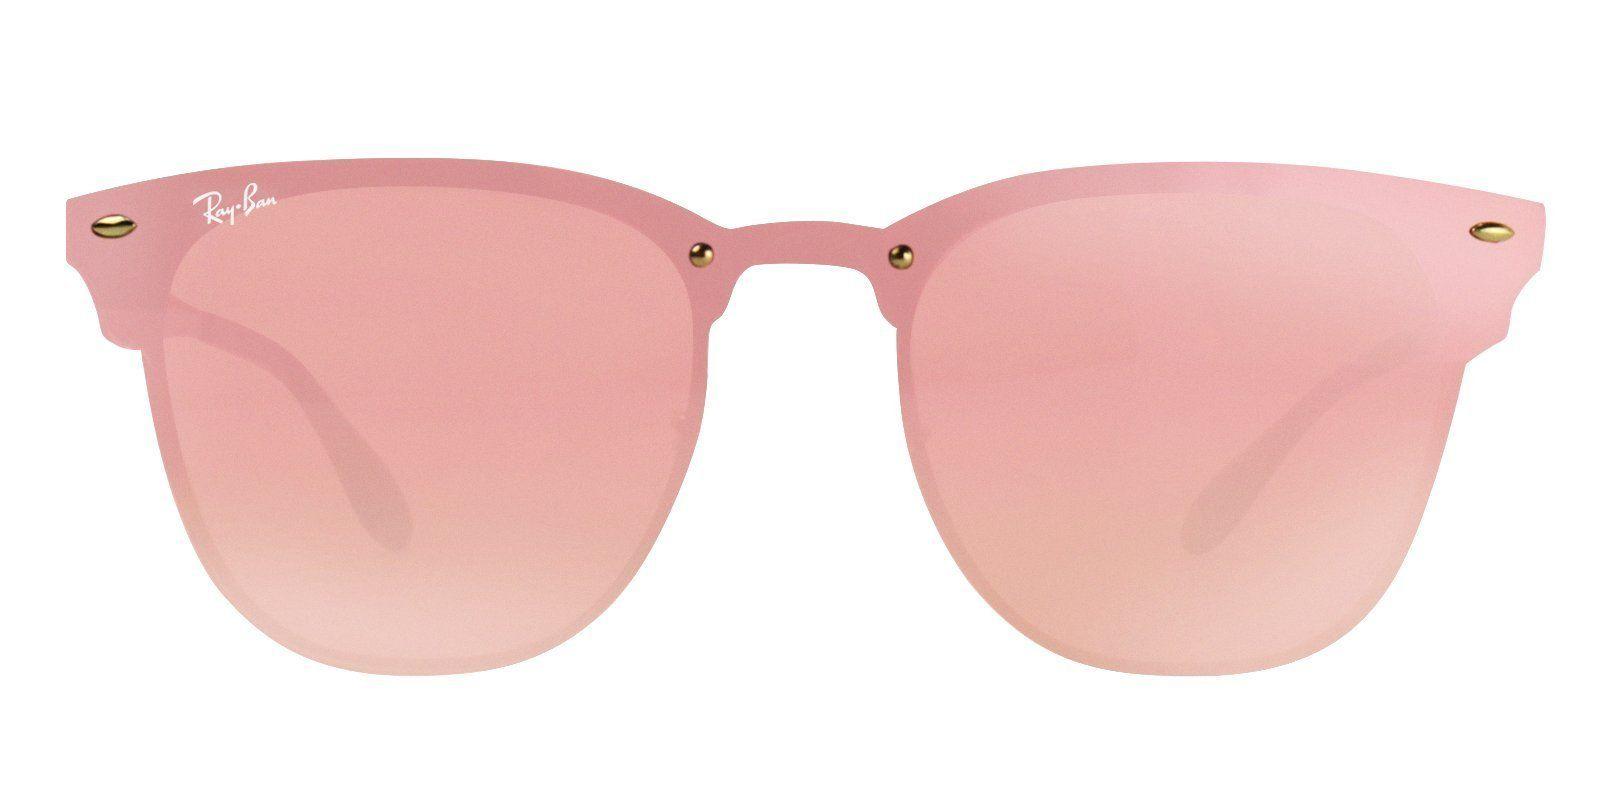 d4810791077b Ray Ban - RB3576N Gold - Pink sunglasses